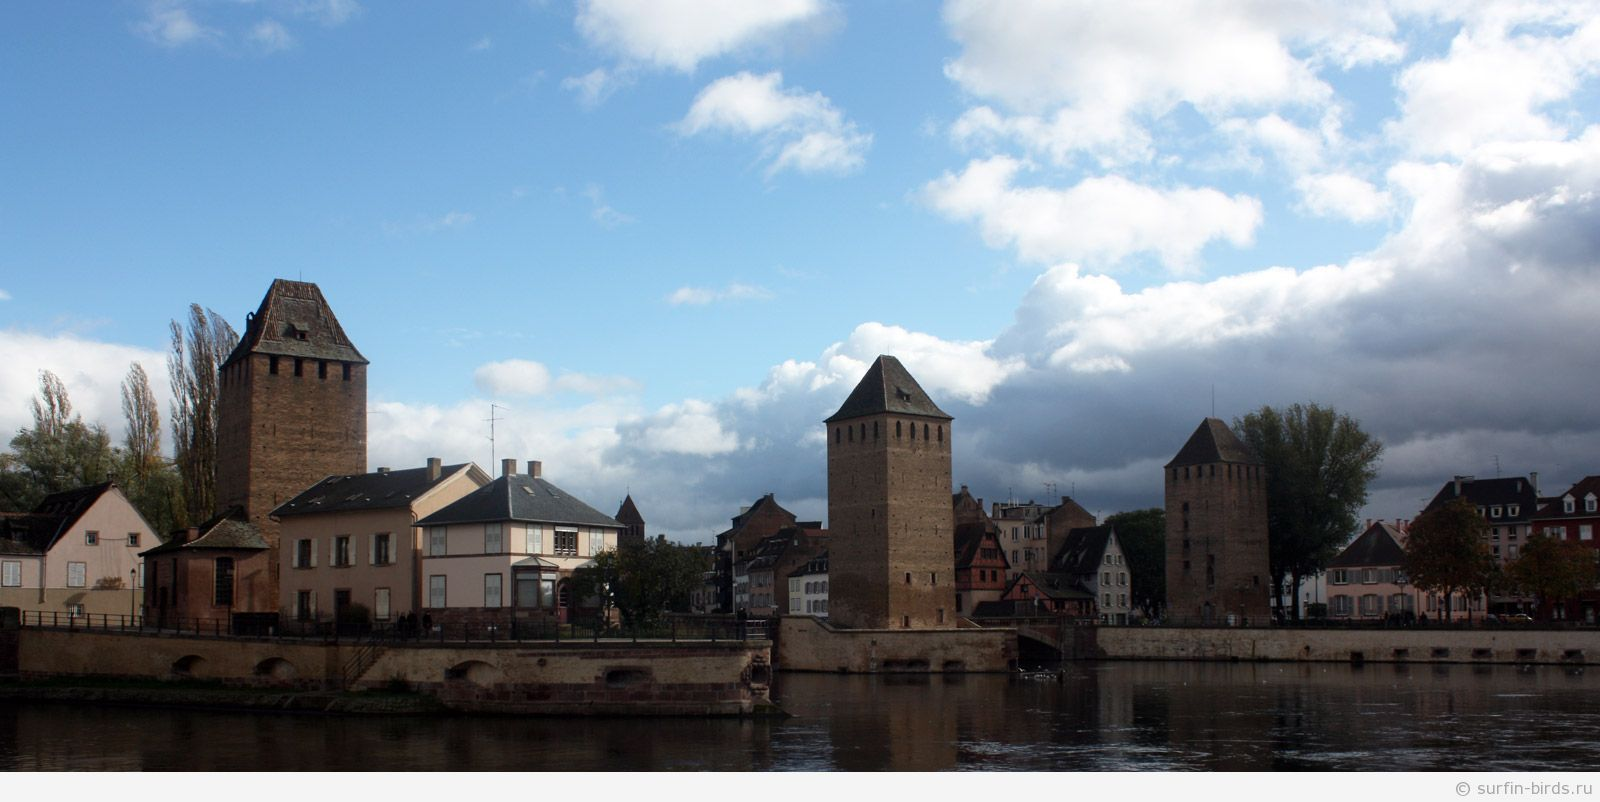 Квартал Маленькая Франция, Страсбург